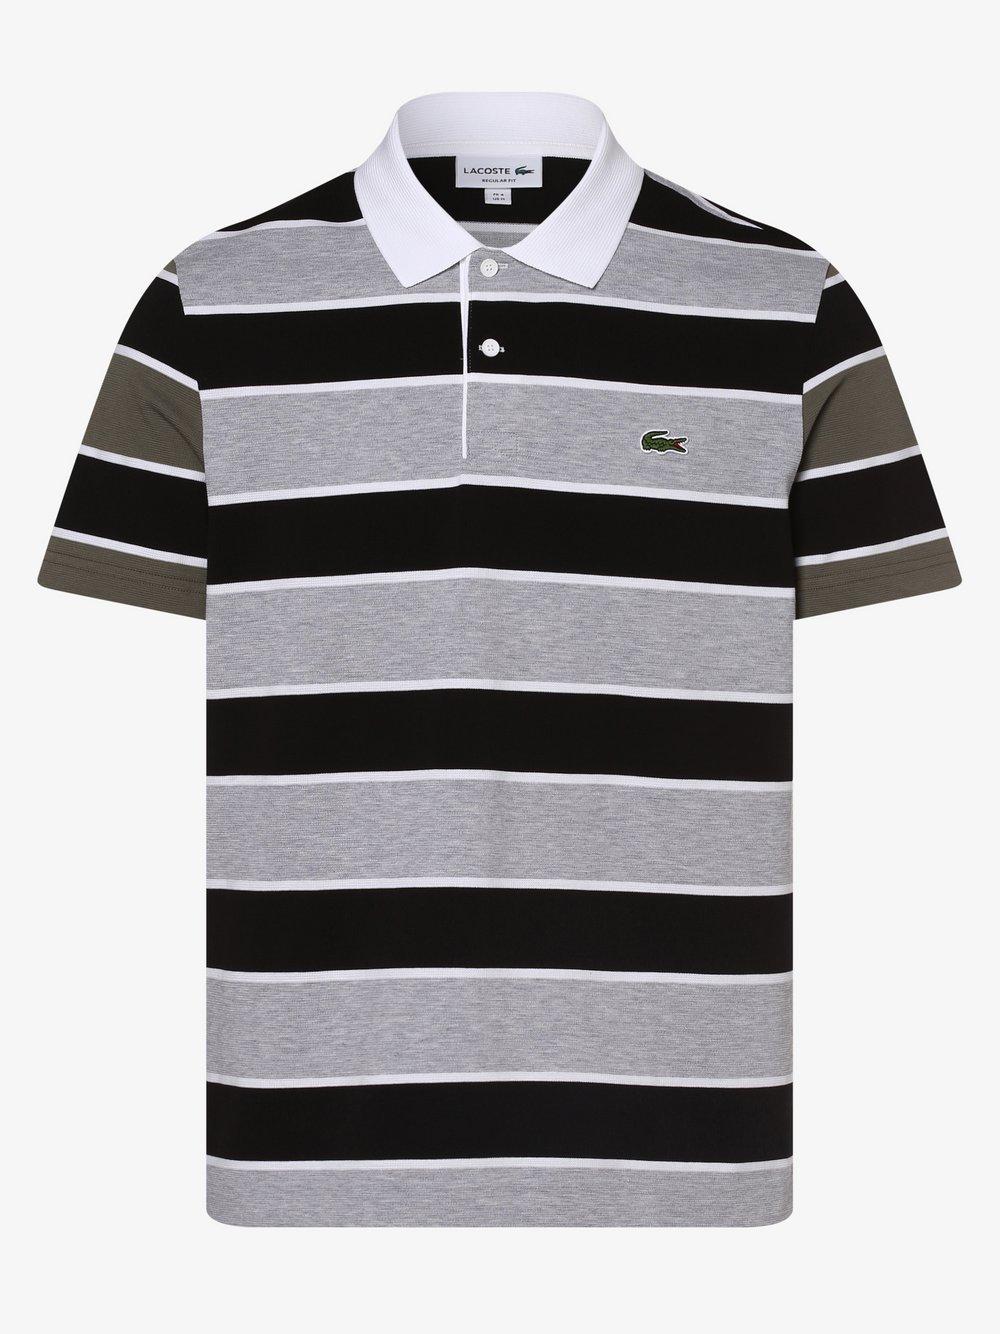 Lacoste - Męska koszulka polo, szary